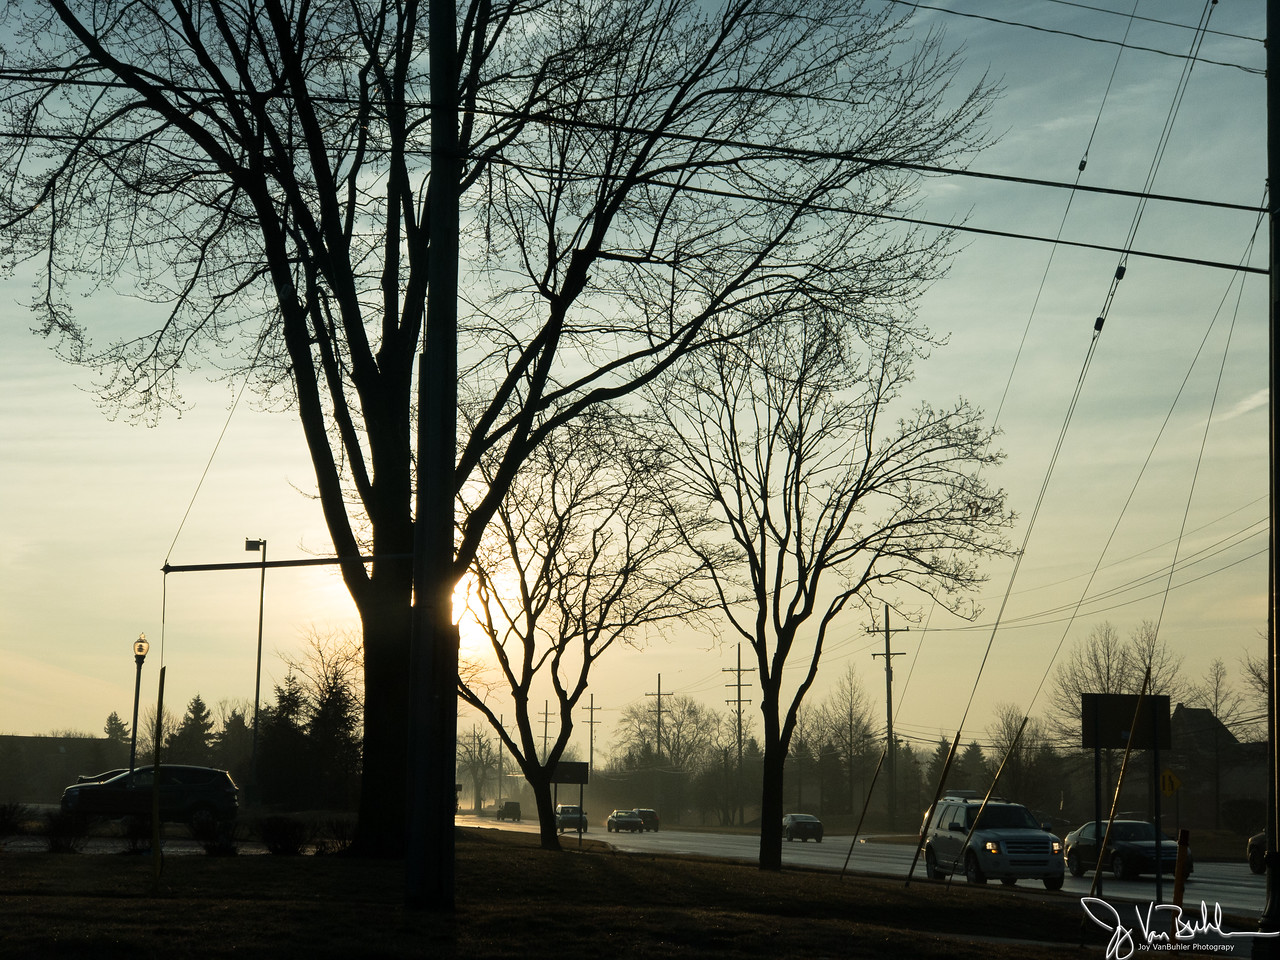 12/52-3: Morning Drive